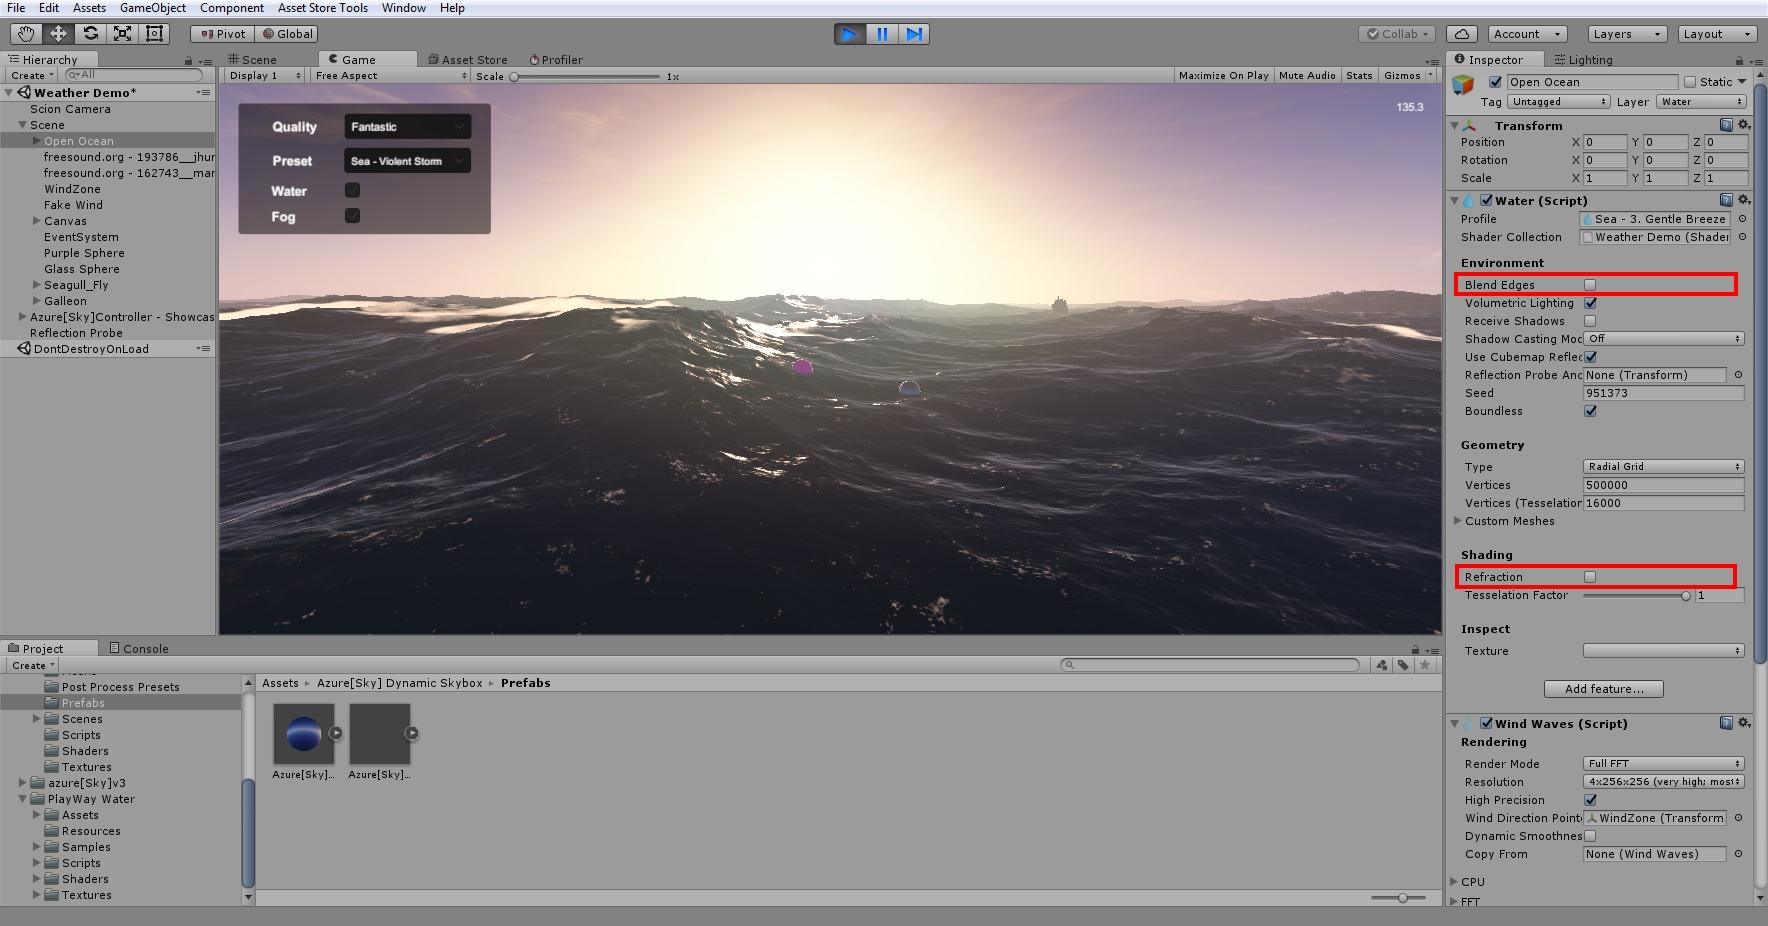 Azure[Sky] - Dynamic Skybox | Page 10 - Unity Forum